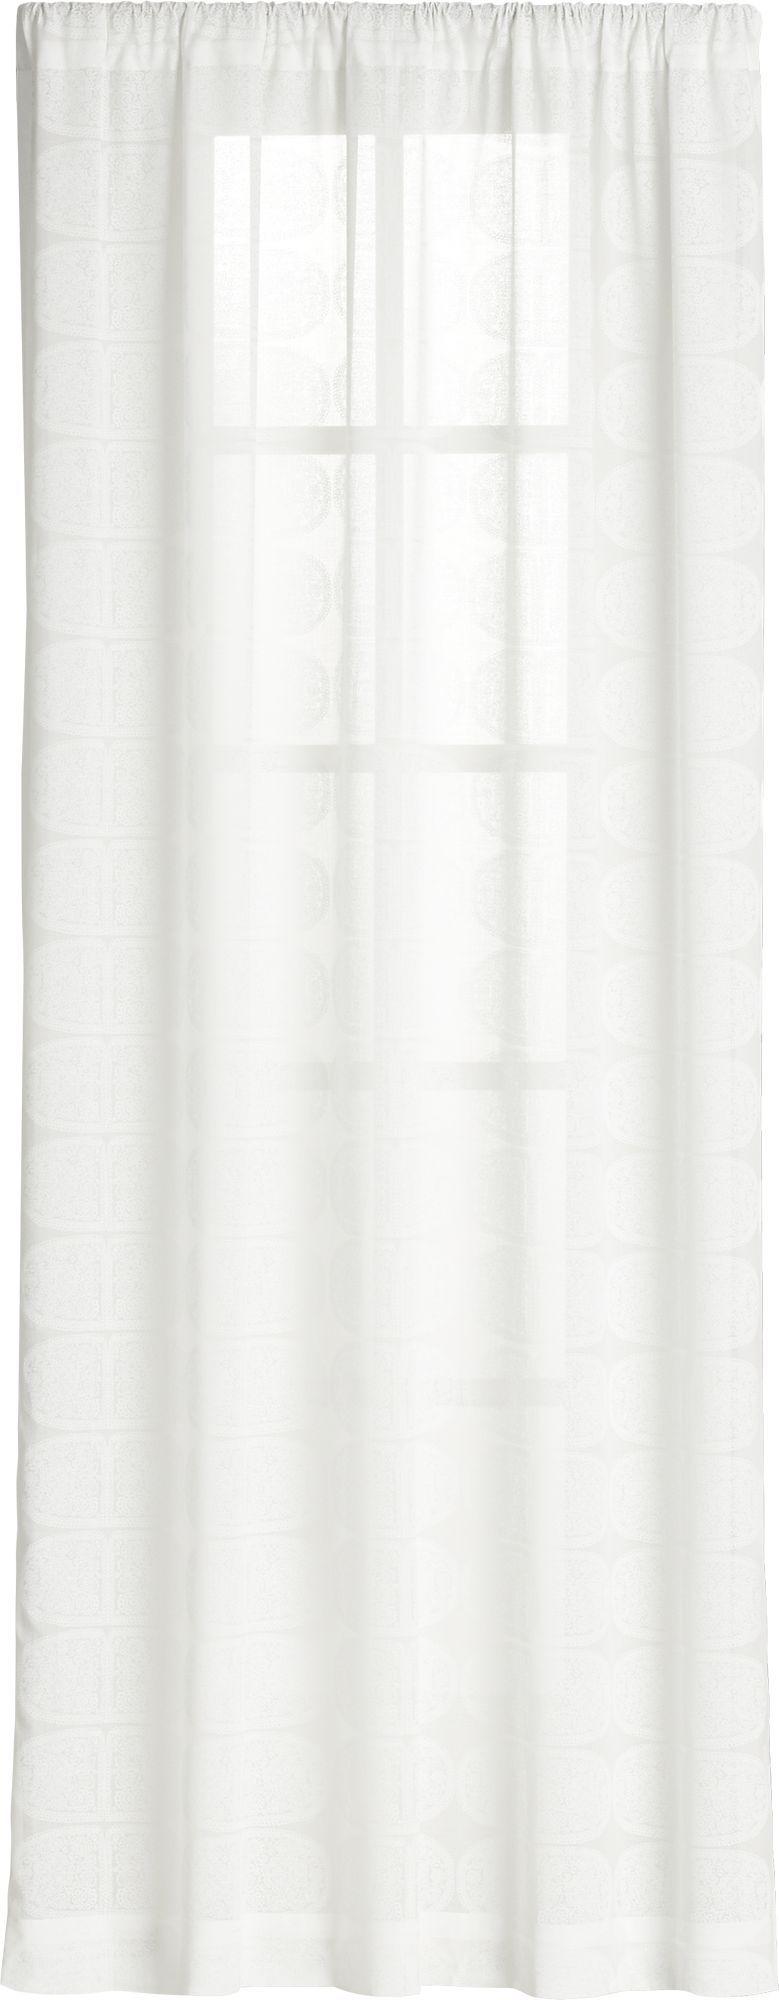 Marimekko Tantsu White Sheer Curtain Panel In Marimekko